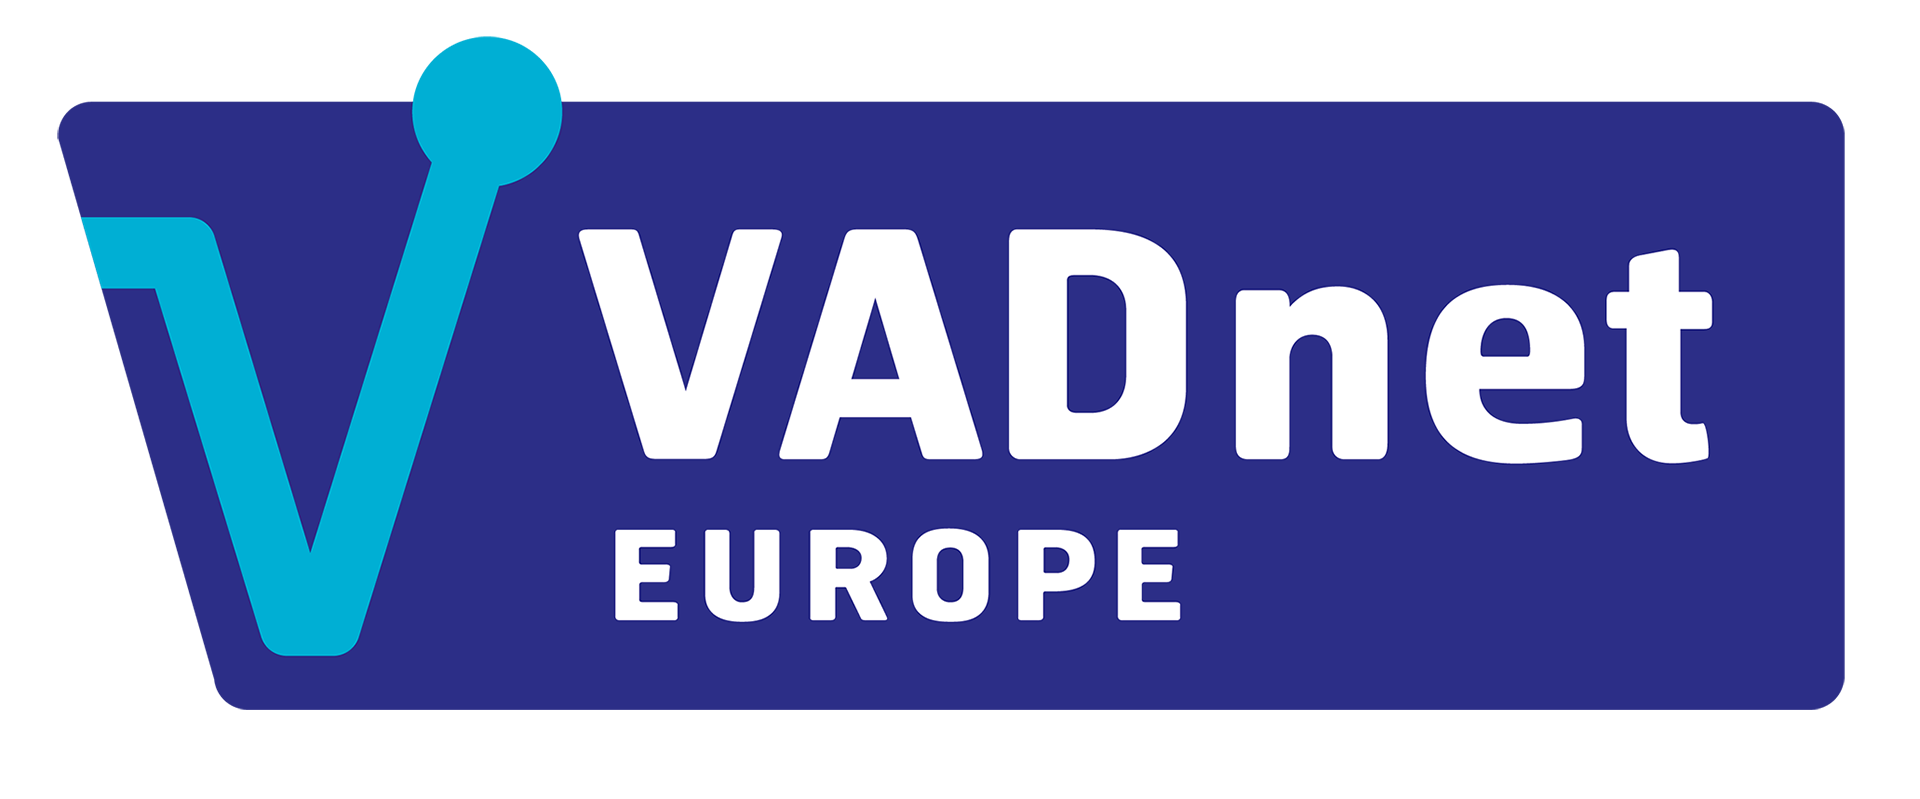 VADnet logo 2019 1920px